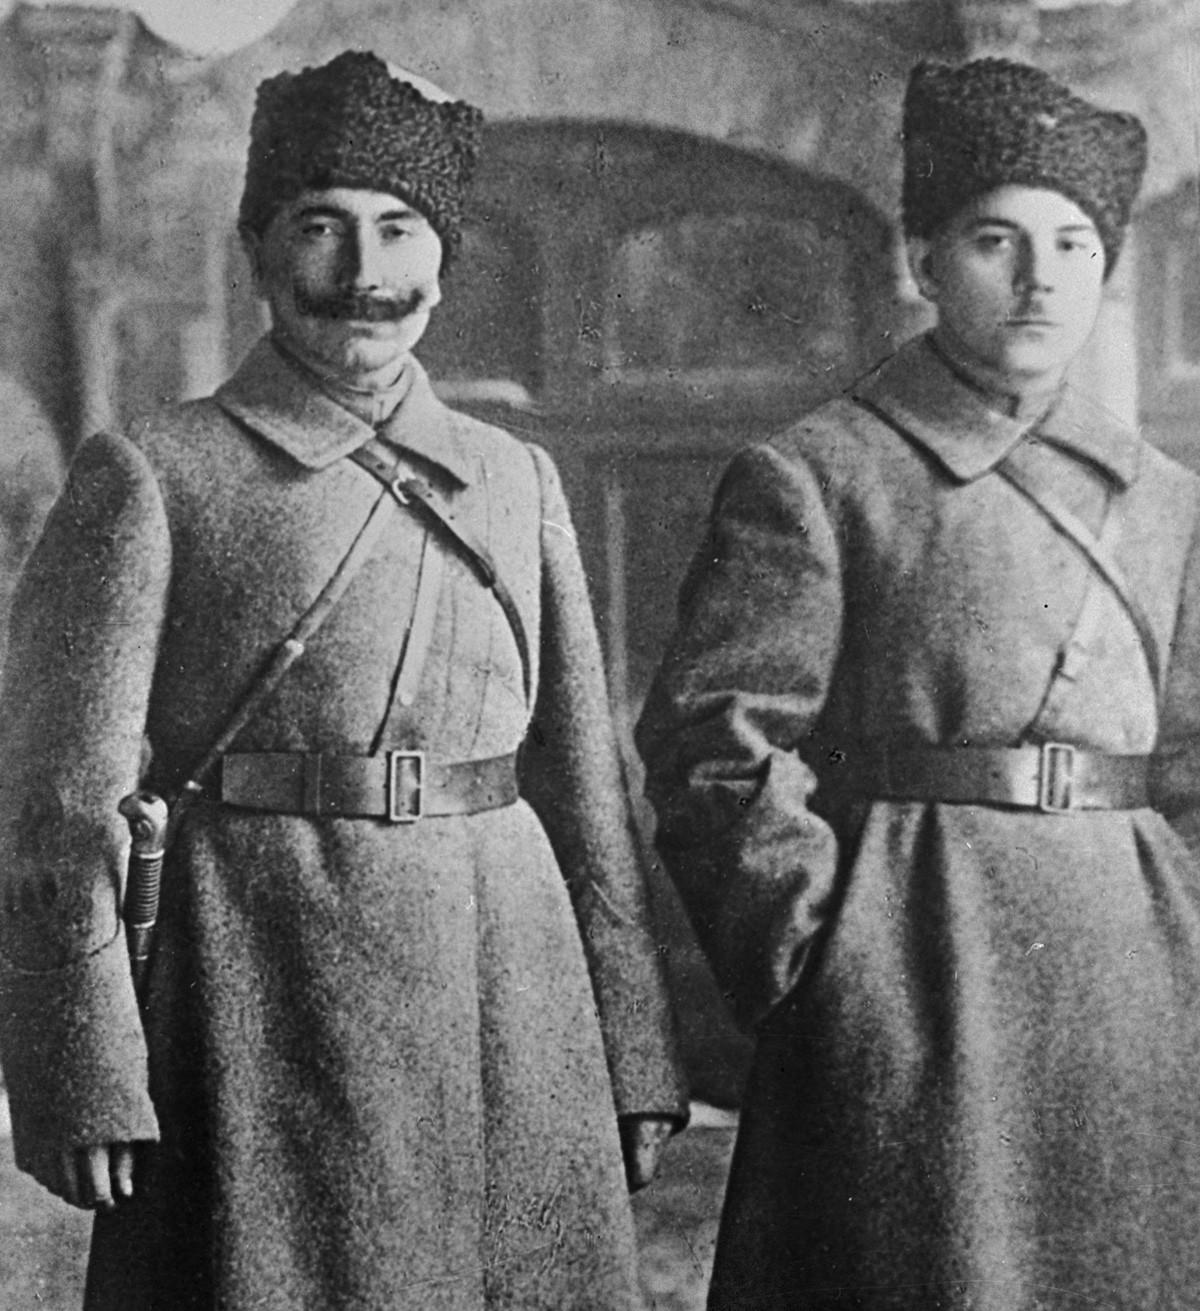 Semjon Budjonny und Kliment Woroschilow im Jahr 1918